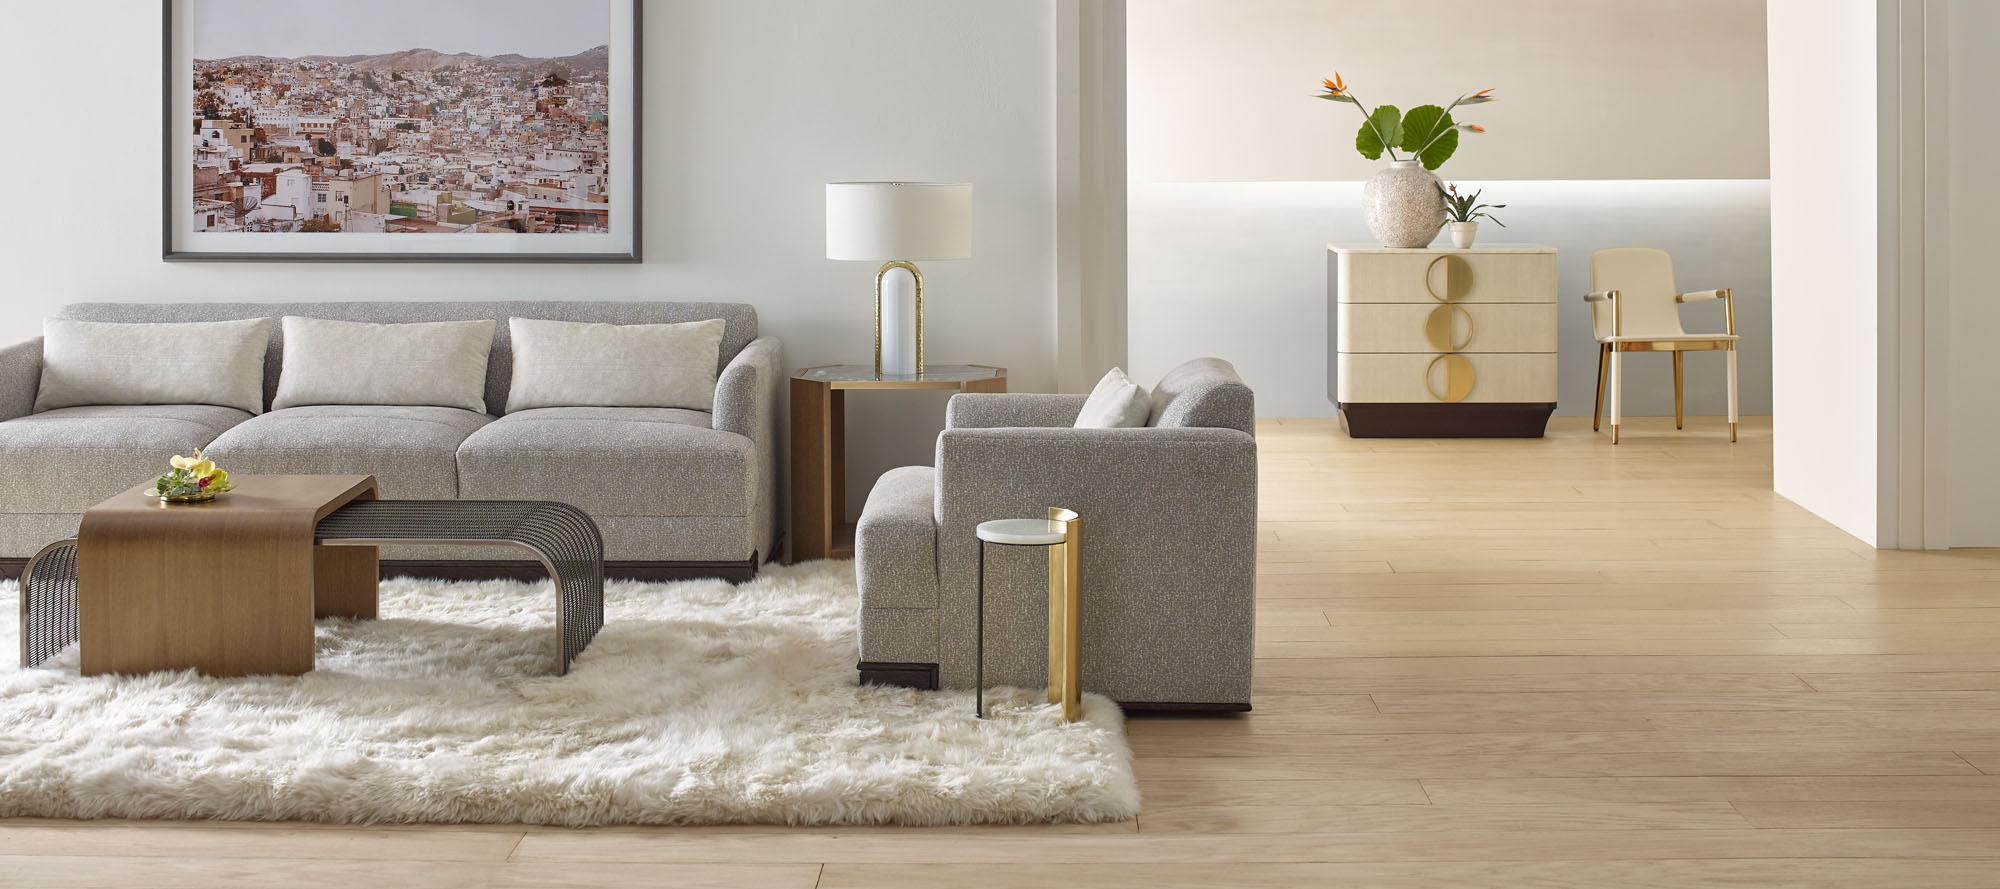 The Laura Kirar Collection   Baker Furniture